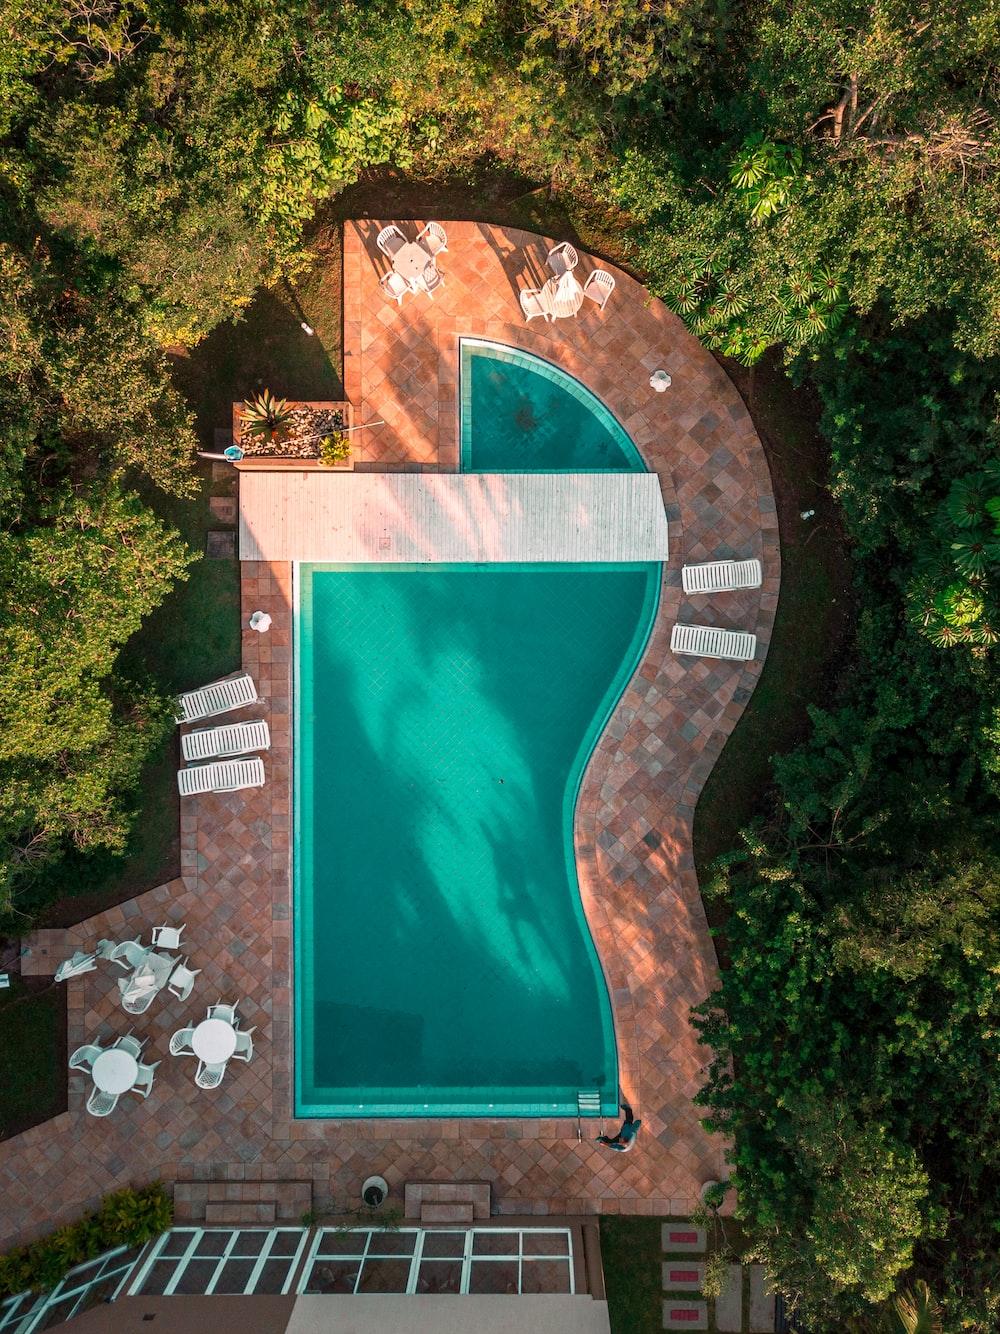 aerial photo of swimming pool between trees